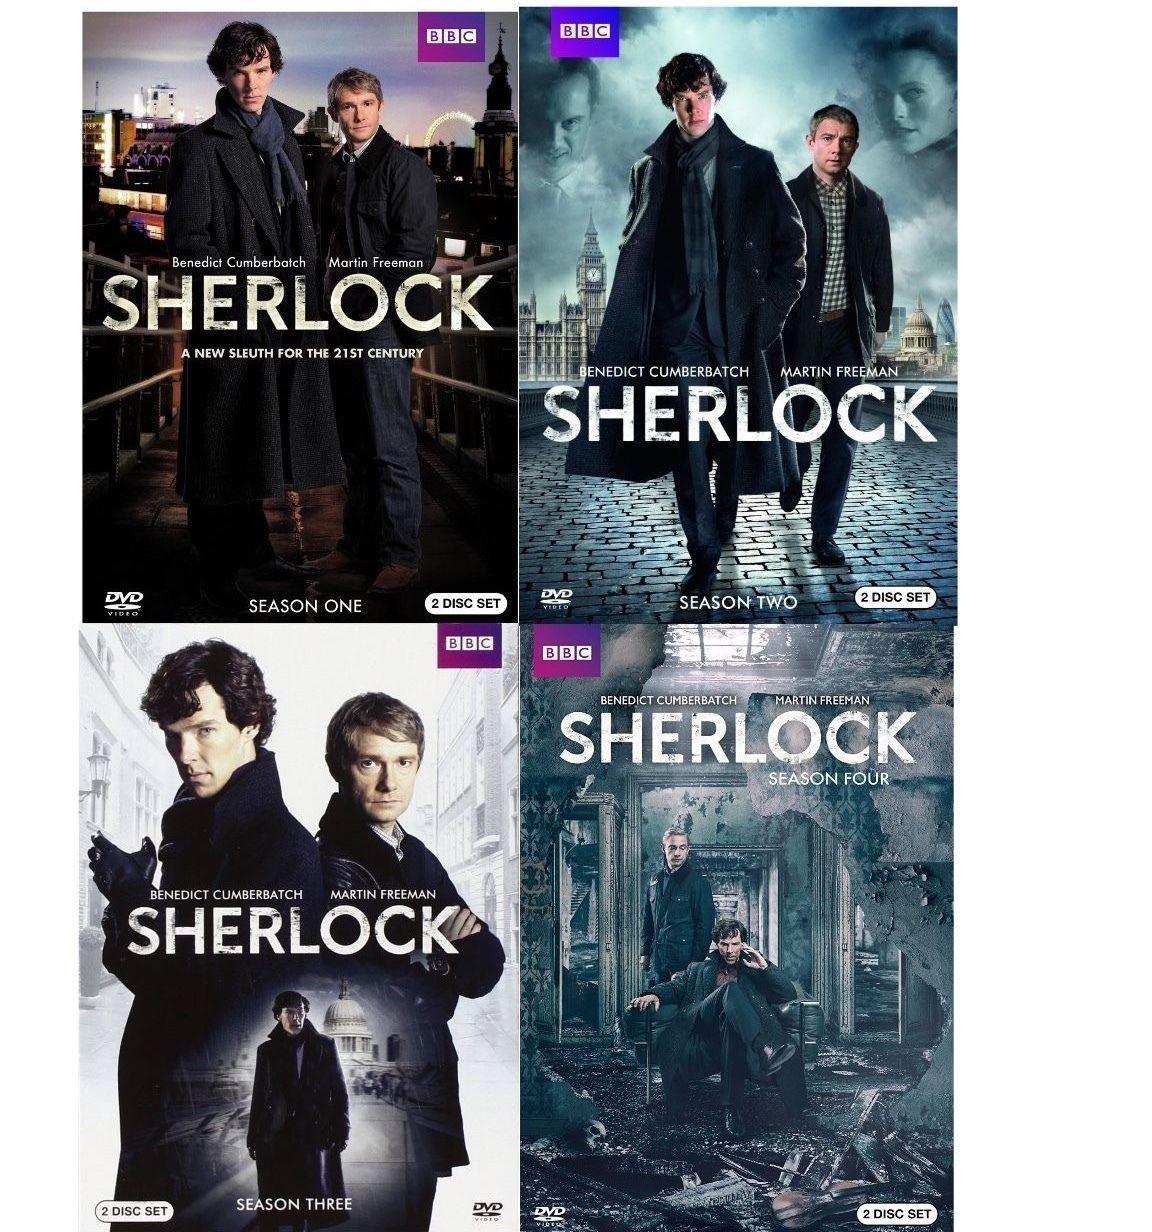 Sherlock: The Complete Series Season 1 2 3 & 4 [DVD Sets] BBC TV Show